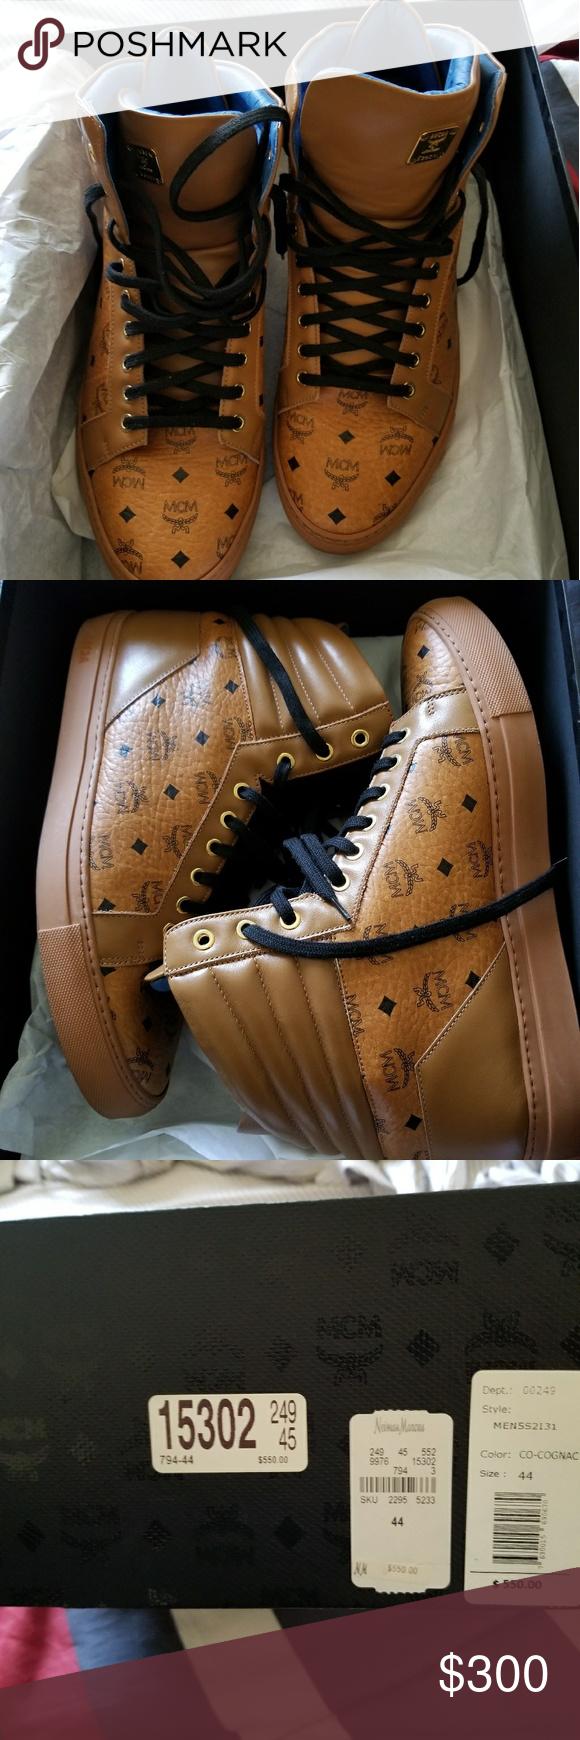 MCM Shoes Size 44 MCM Shoes Sneakers Mcm shoes, Shoes